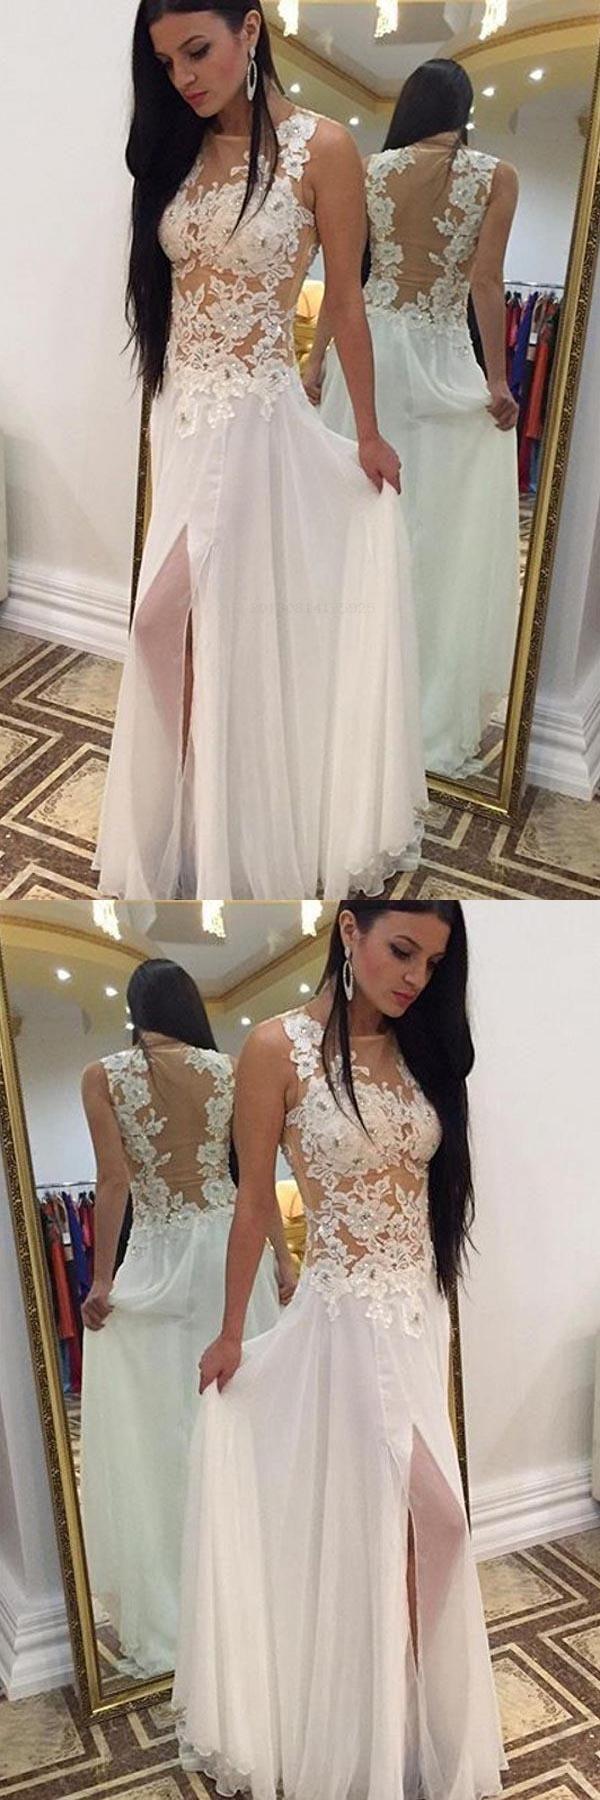 Prom dress white homecoming dress long sleeveless prom dress lace